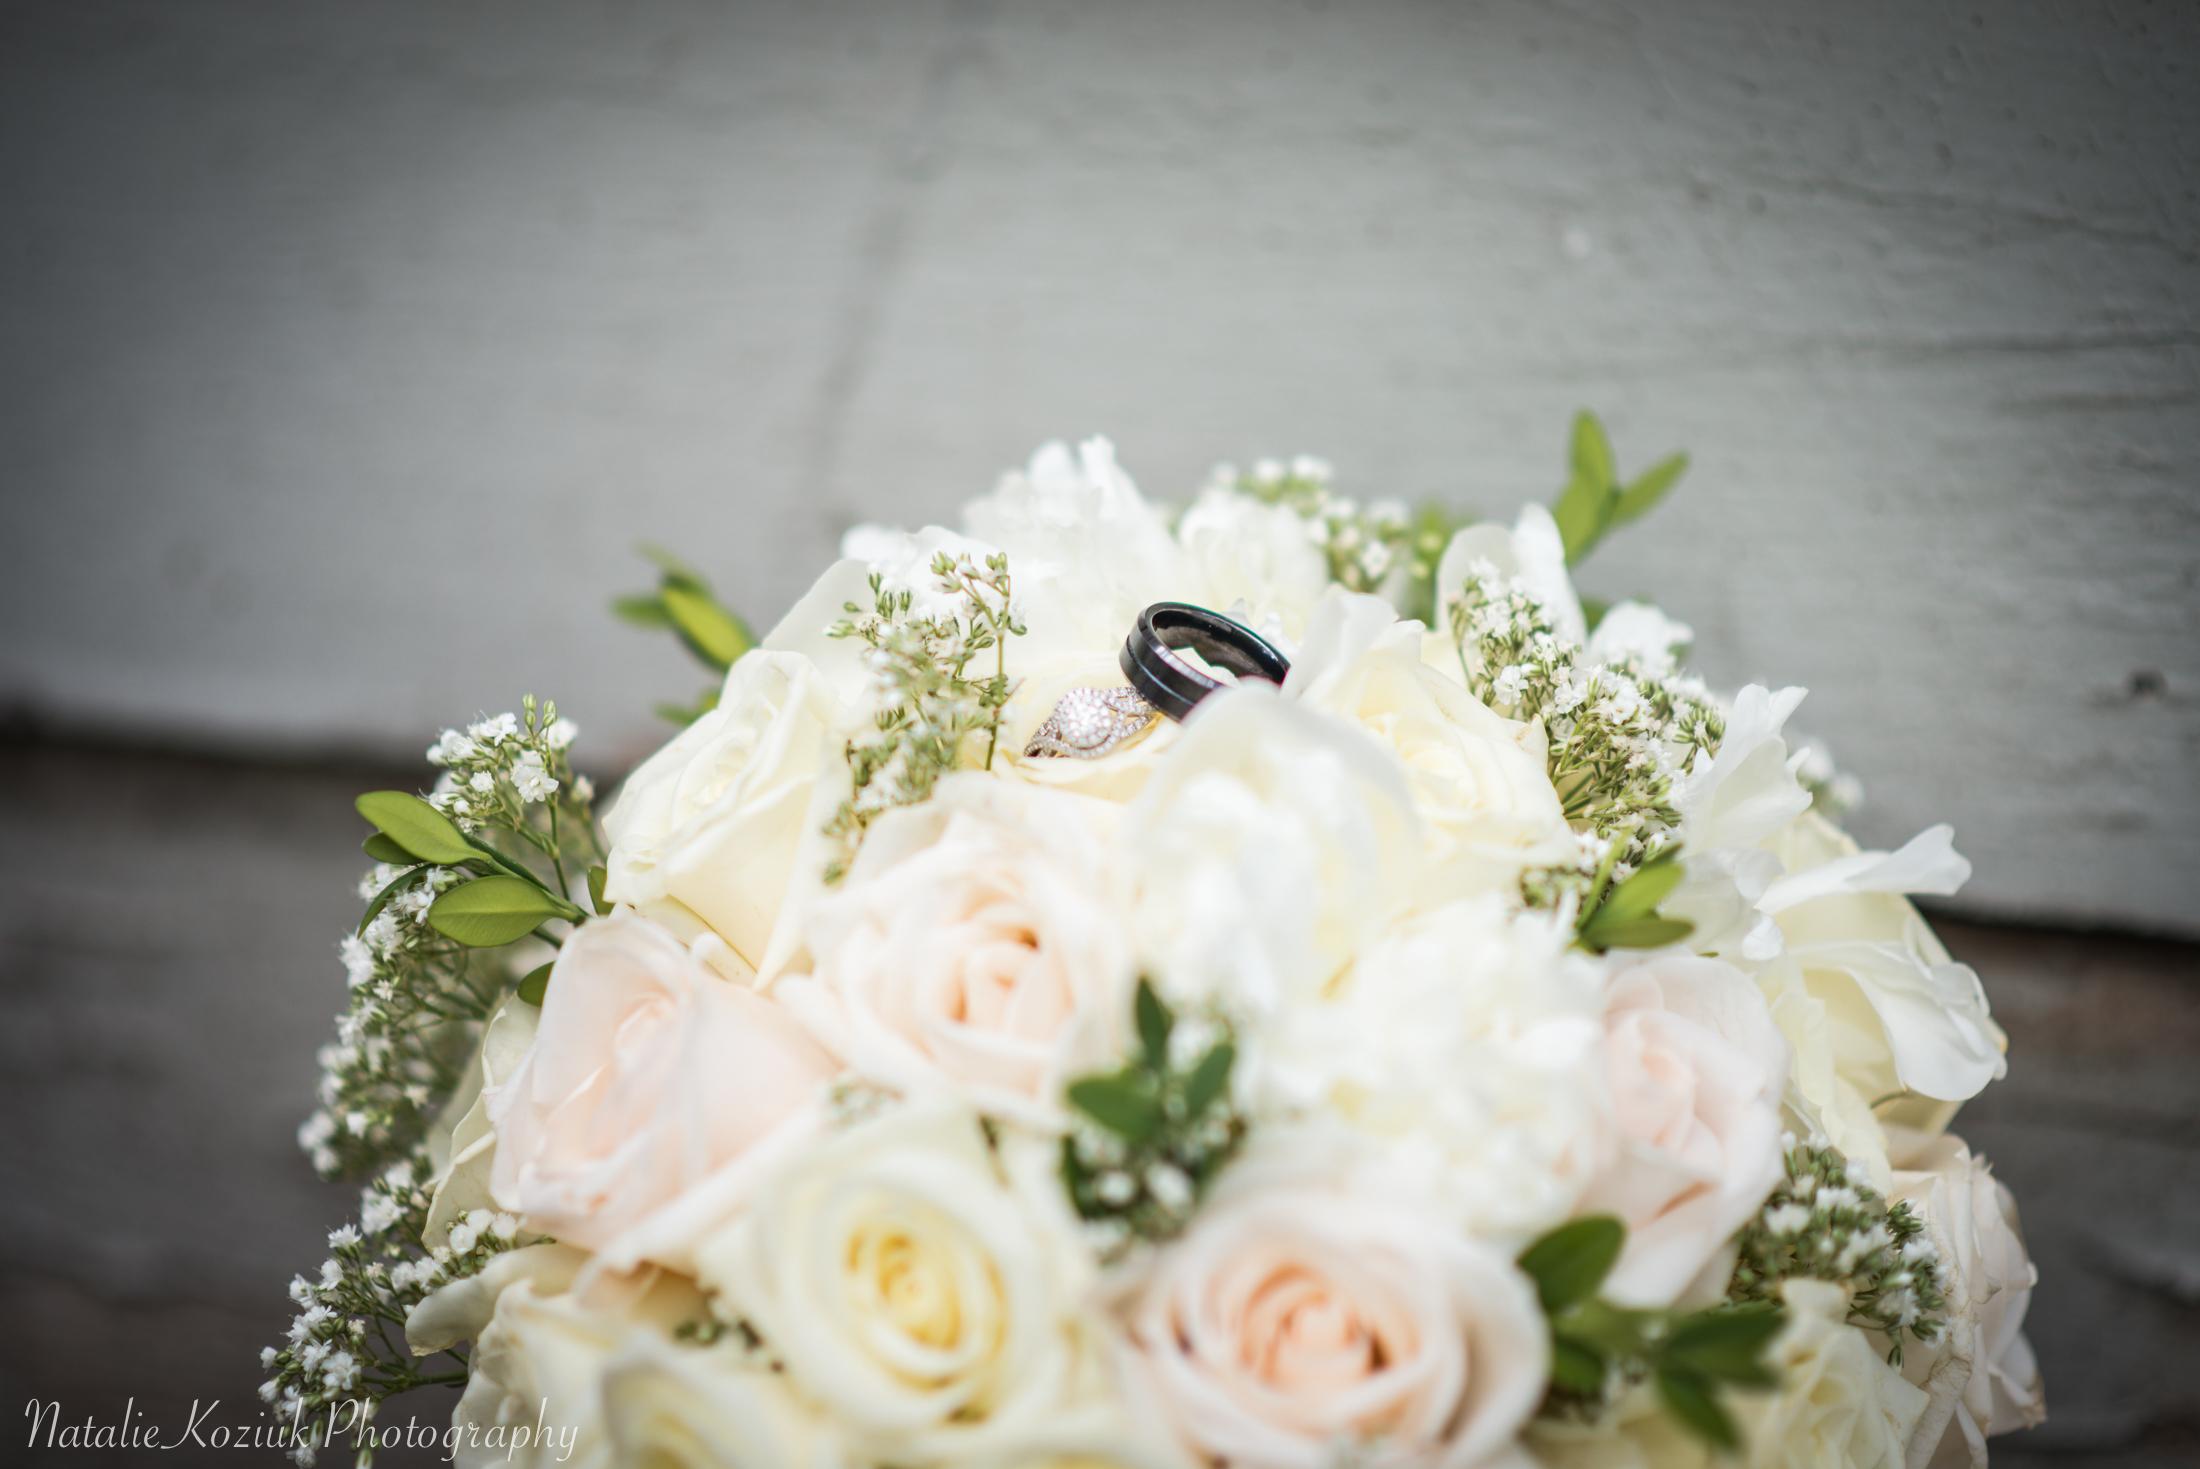 Natalie Koziuk Photography | Boise wedding photographer | bouquet | Star, ID | Bride Groom | nkoziukphotography.com